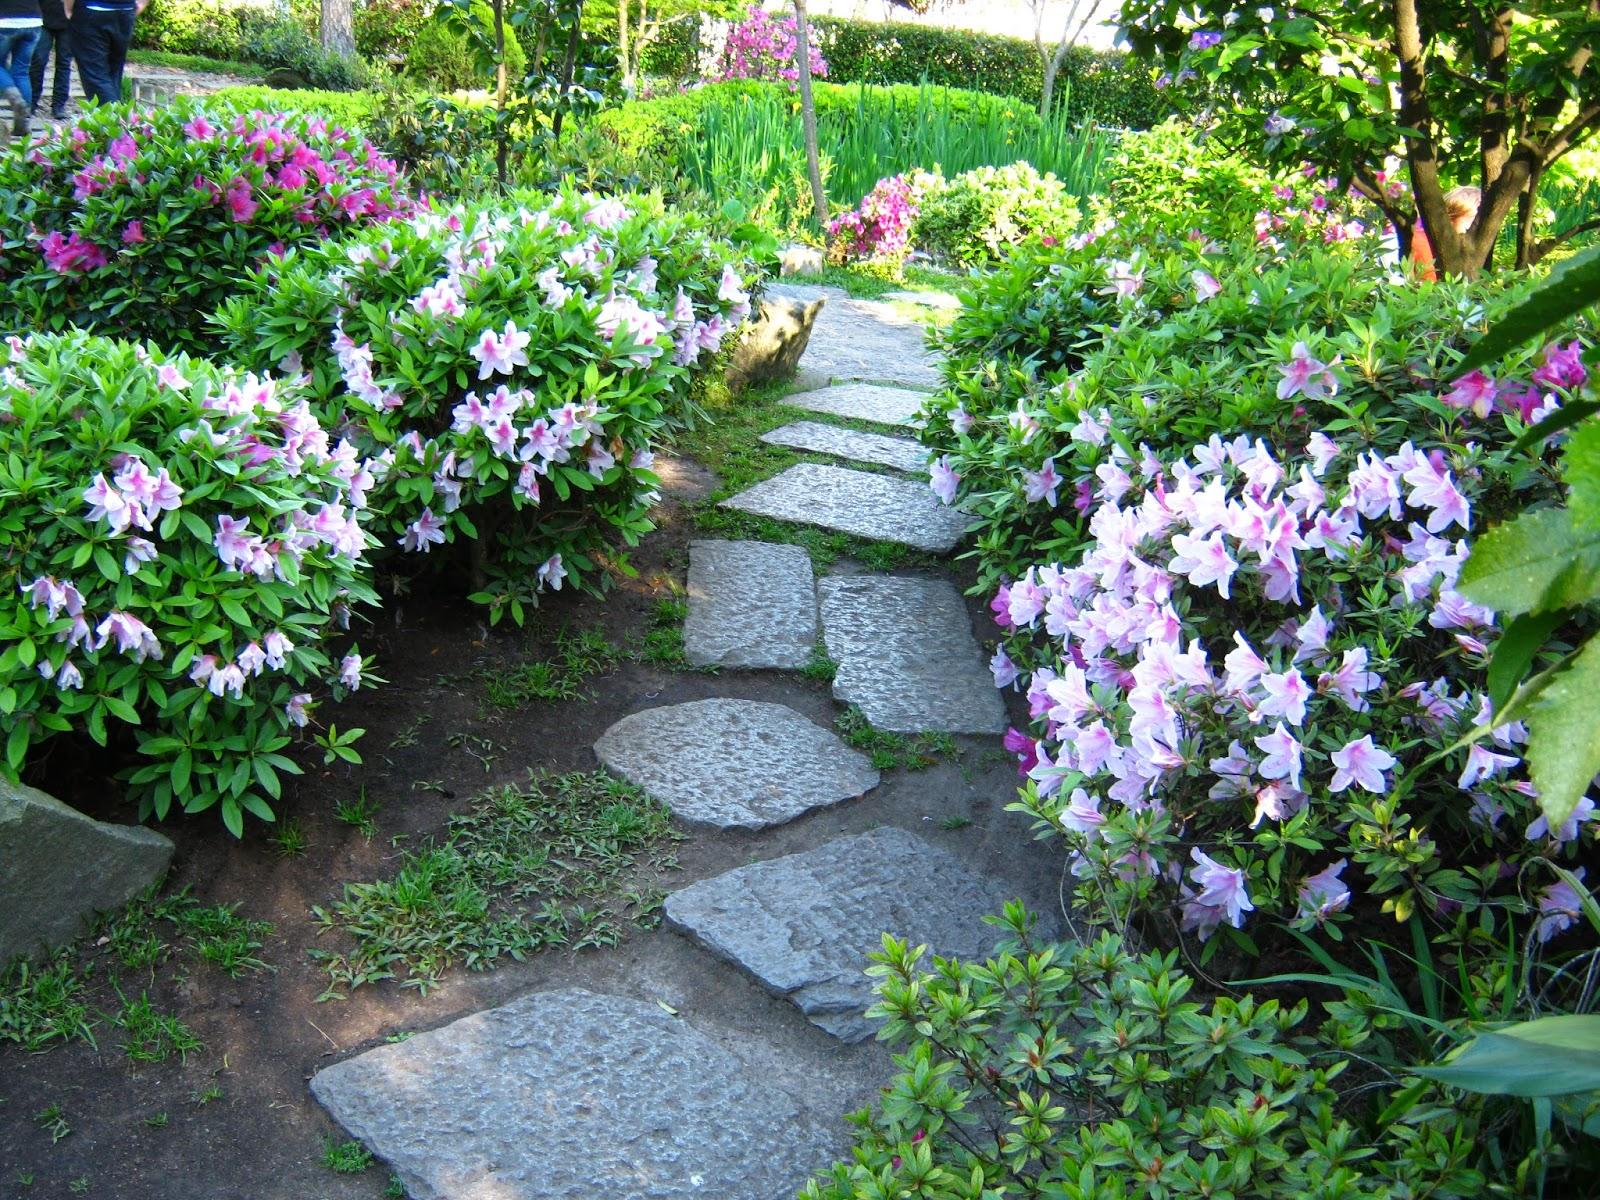 Fotos uruguay jardin japones montevideo - Fotos jardines japoneses ...